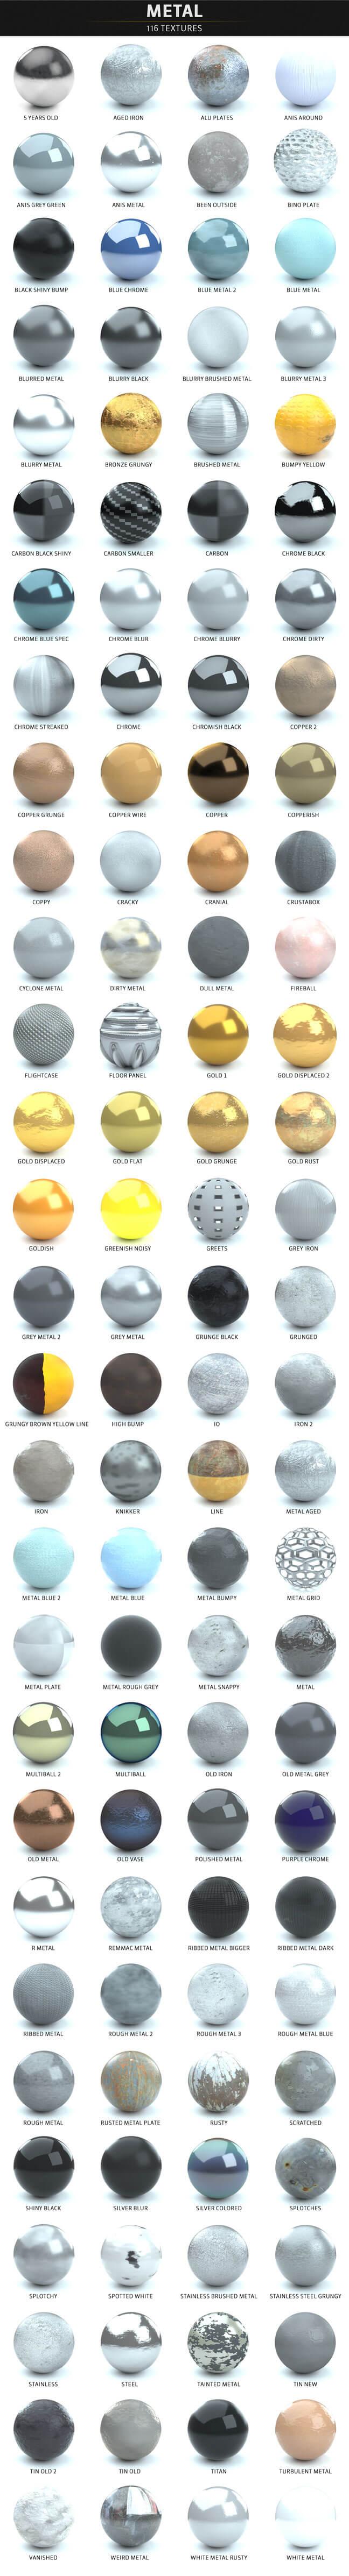 C4D-Otoy-Octane-Render-Material-Textures-Pack-Metal